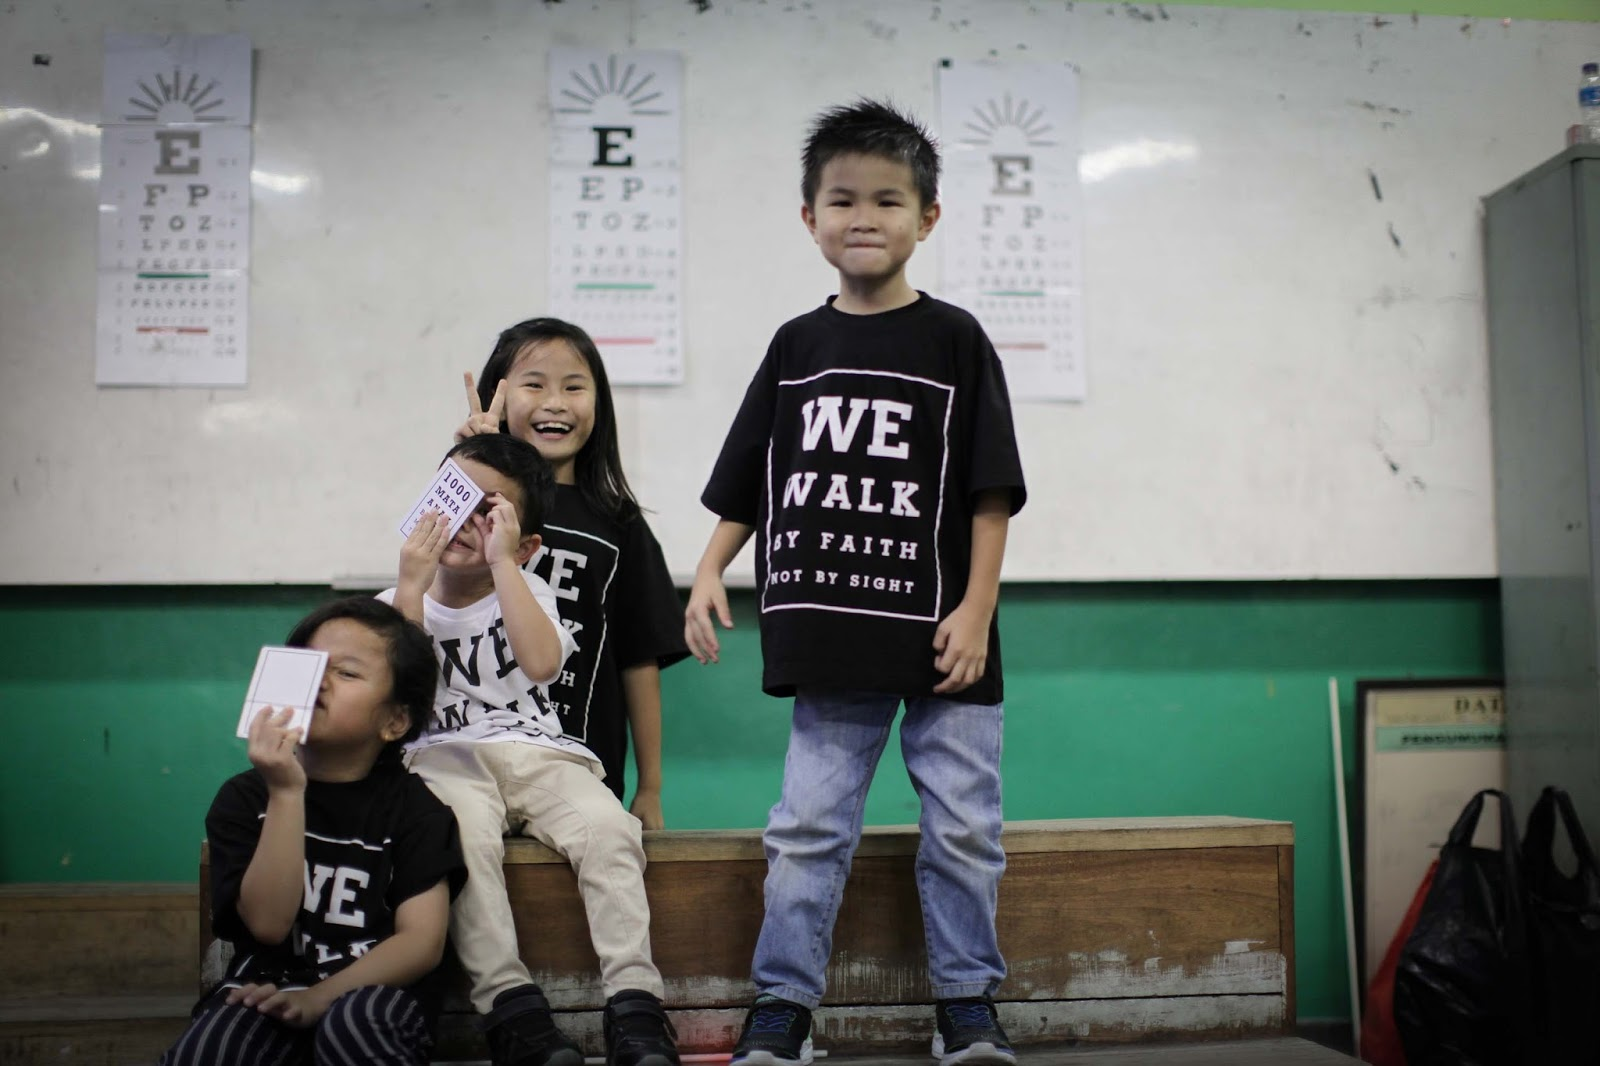 Bakti Sosial IX - Sejuta Kacamata untuk Indonesia - Kampung Duri image